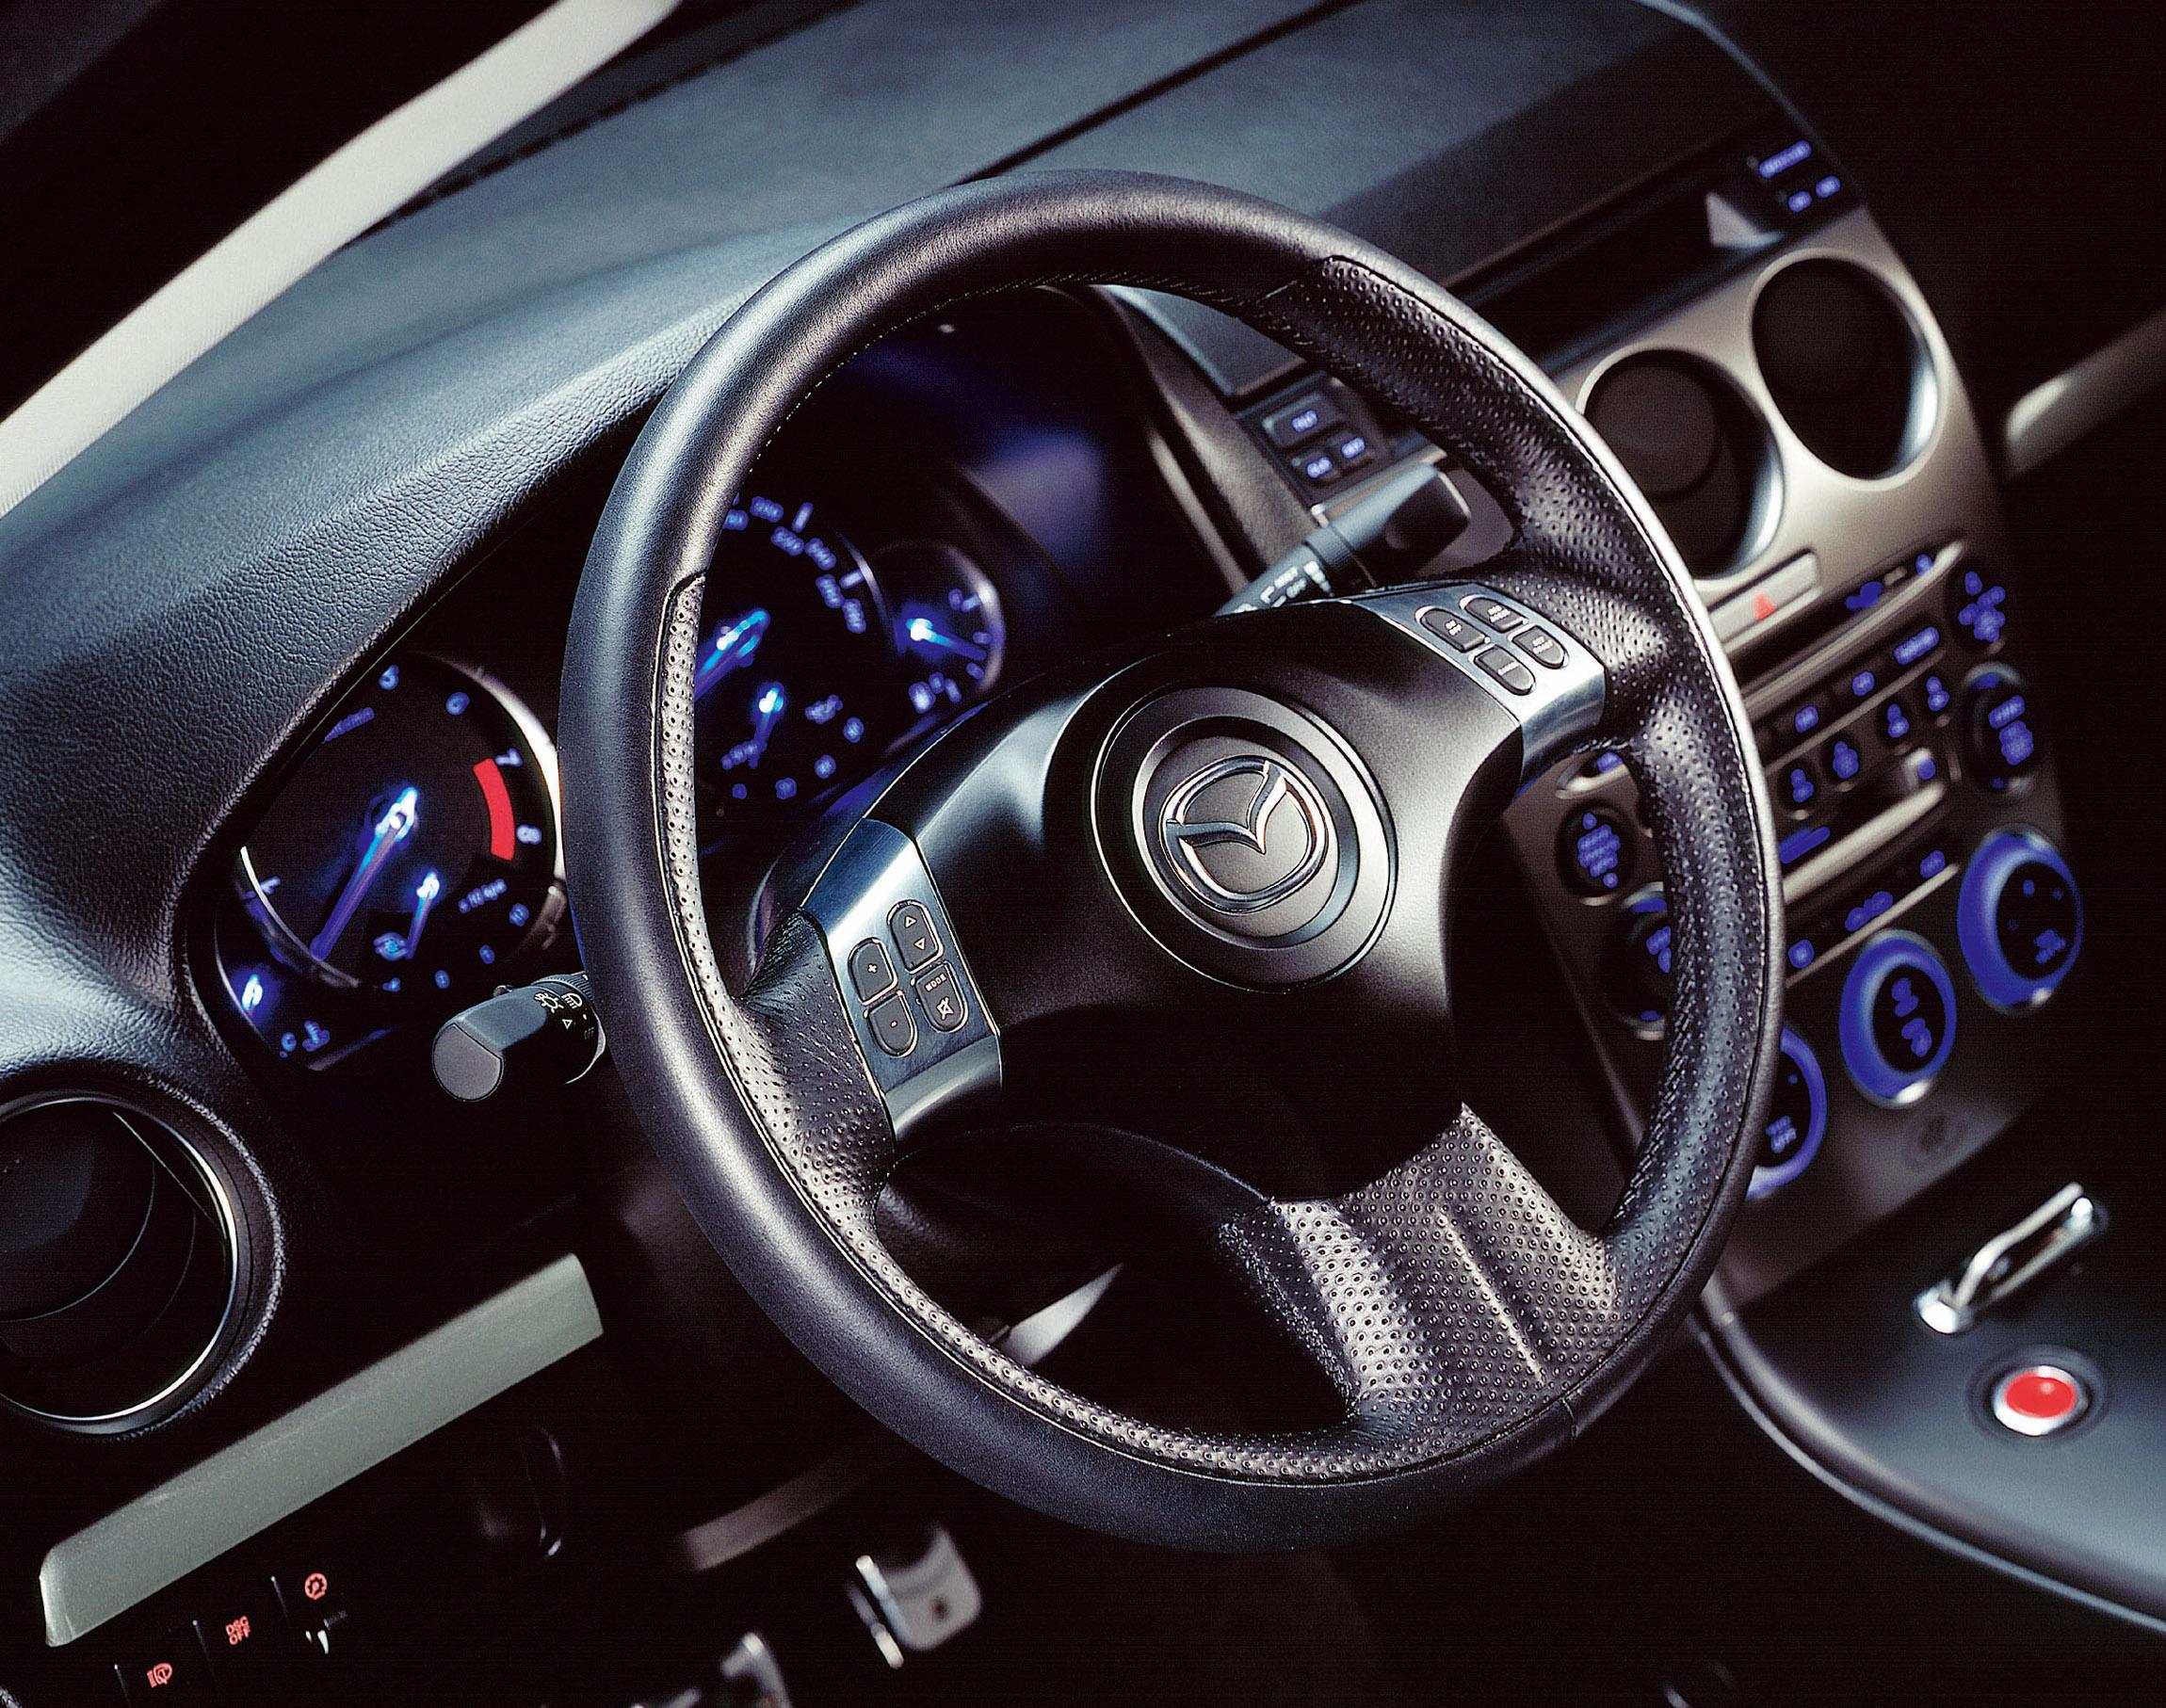 https://www.automobilesreview.com/img/2002-mazda-6-mps-concept/2002-mazda-6-mps-concept-17.jpg